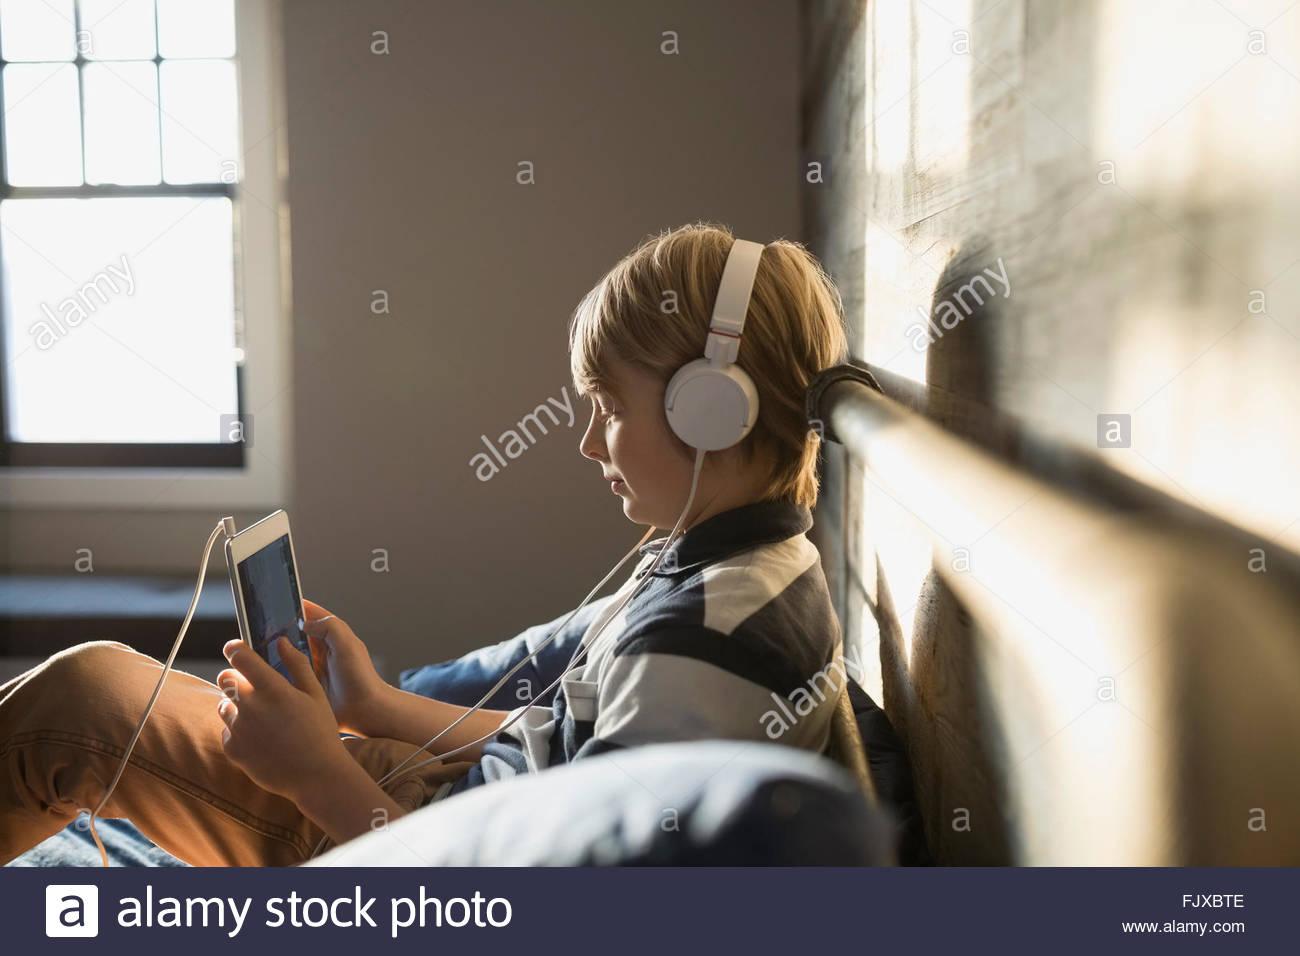 Boy with headphones using digital tablet Stock Photo